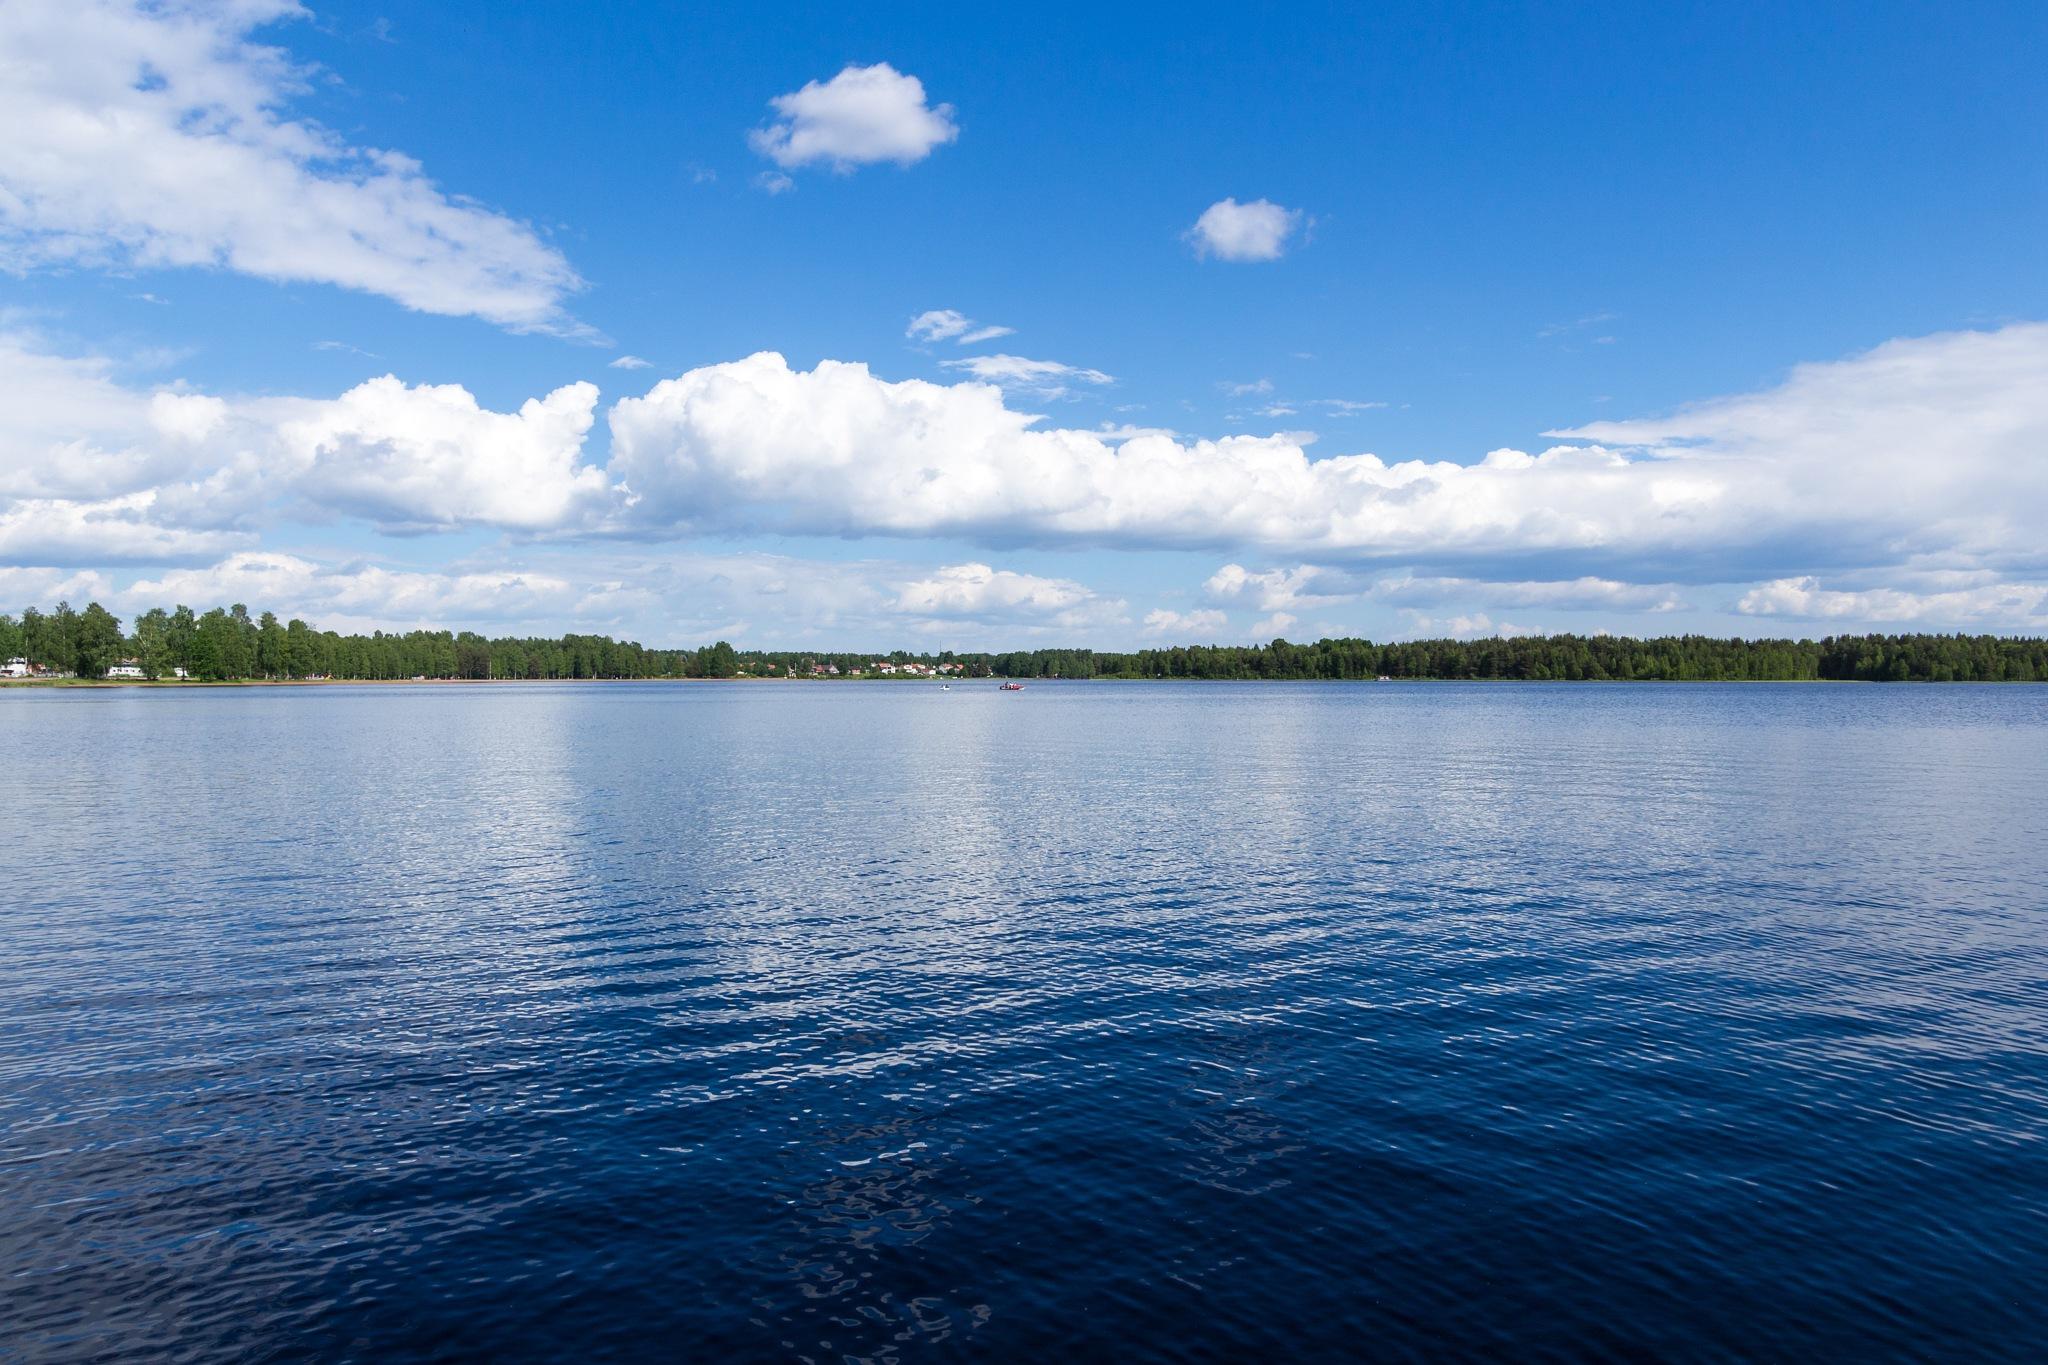 Lake Siljan by Carl Hult